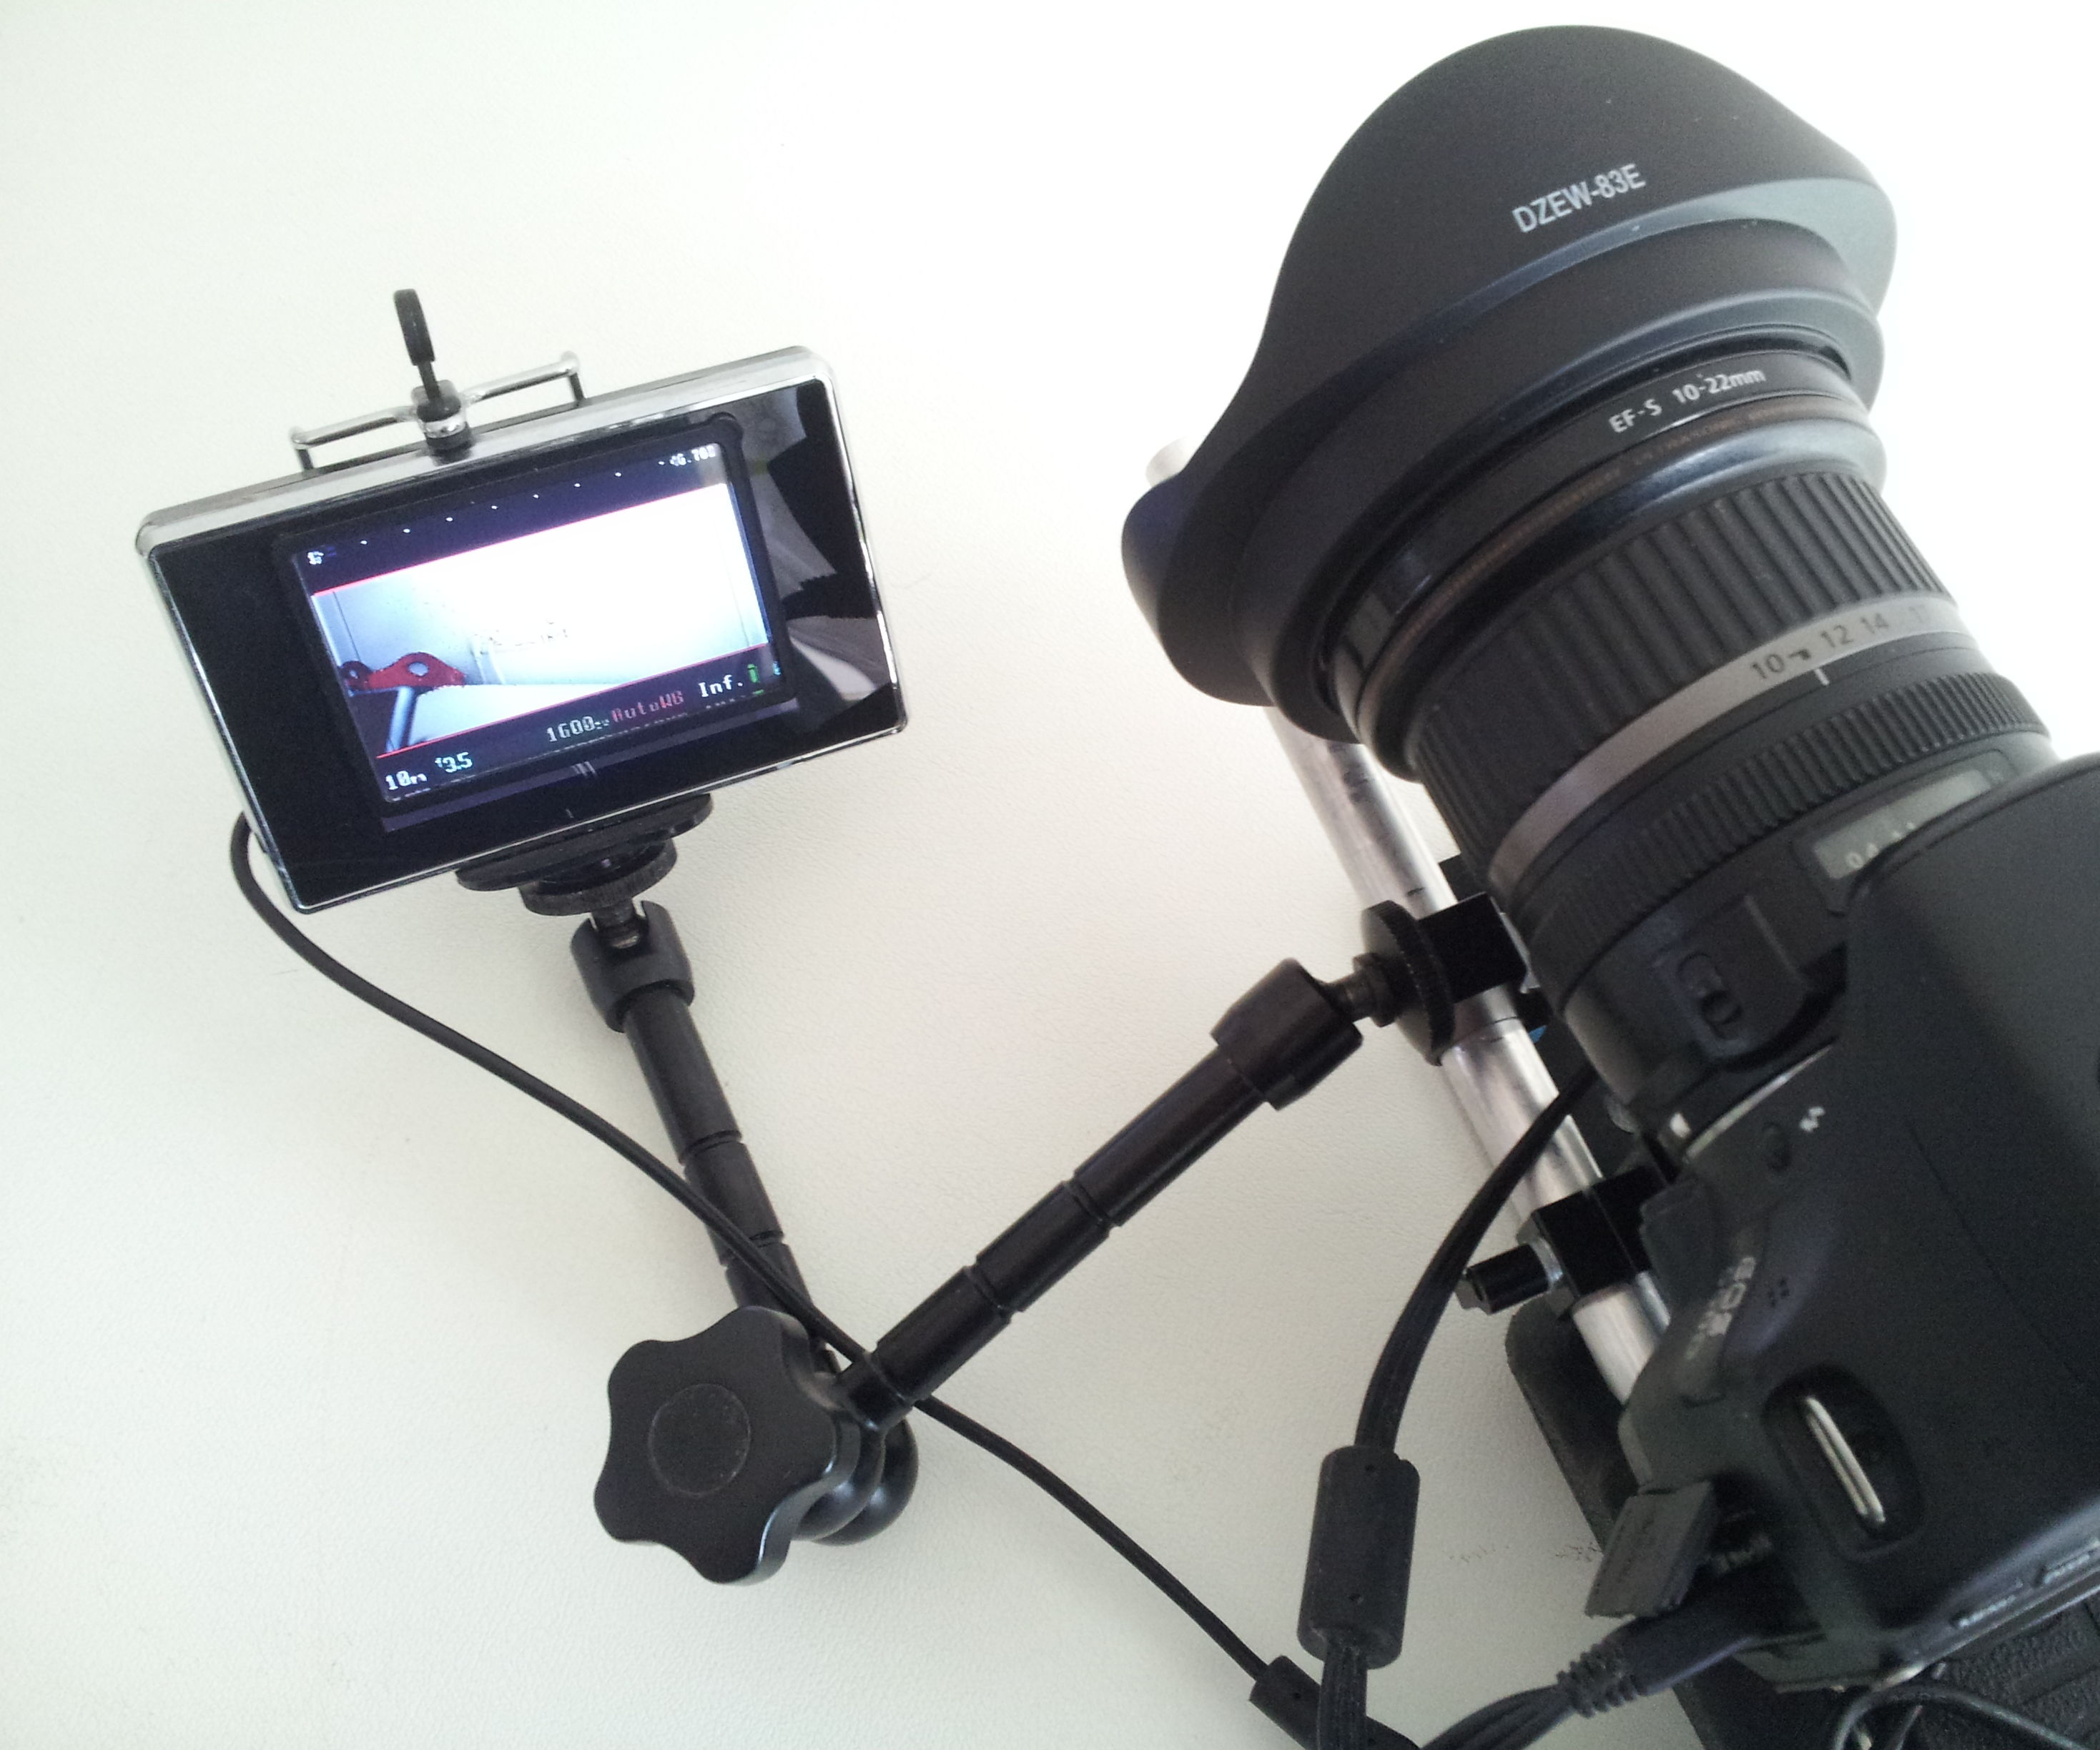 Affordable external monitor / EVF for DSLR